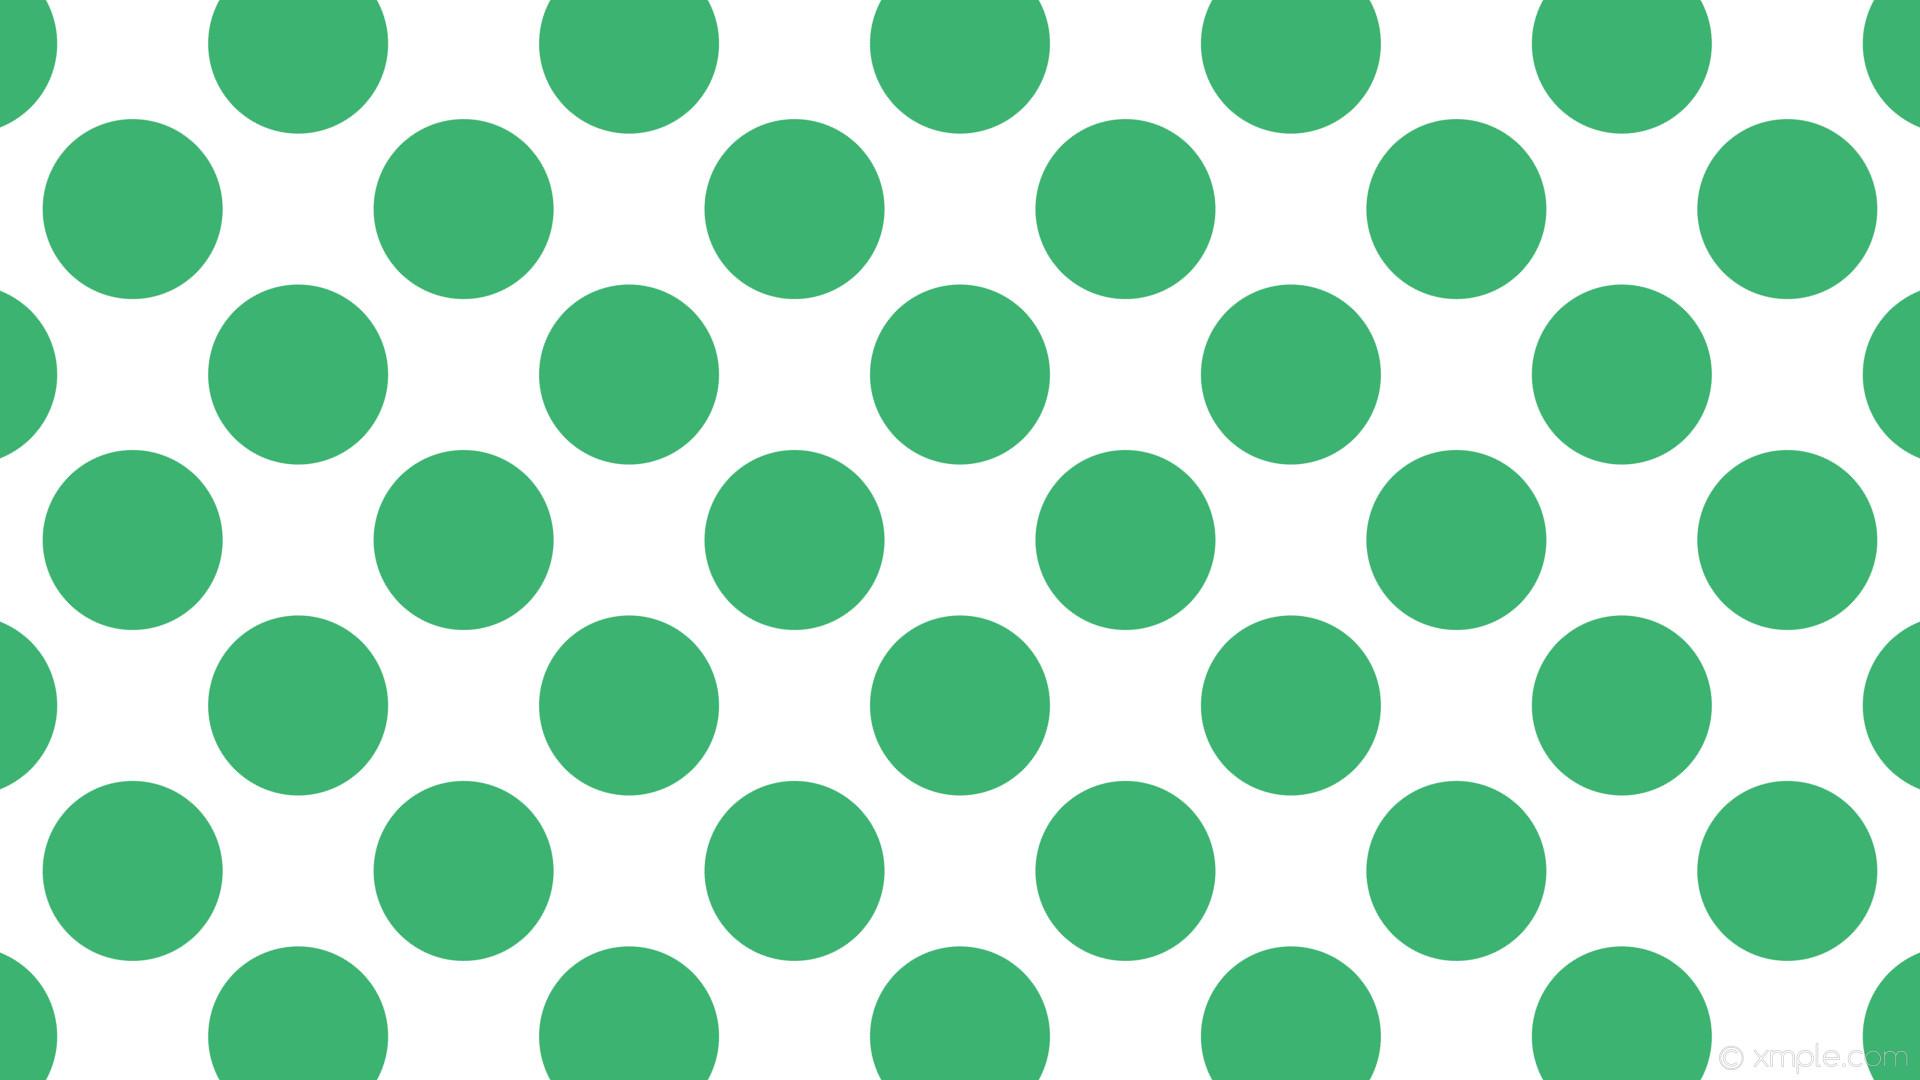 wallpaper white polka dots green spots medium sea green #ffffff #3cb371  135° 180px